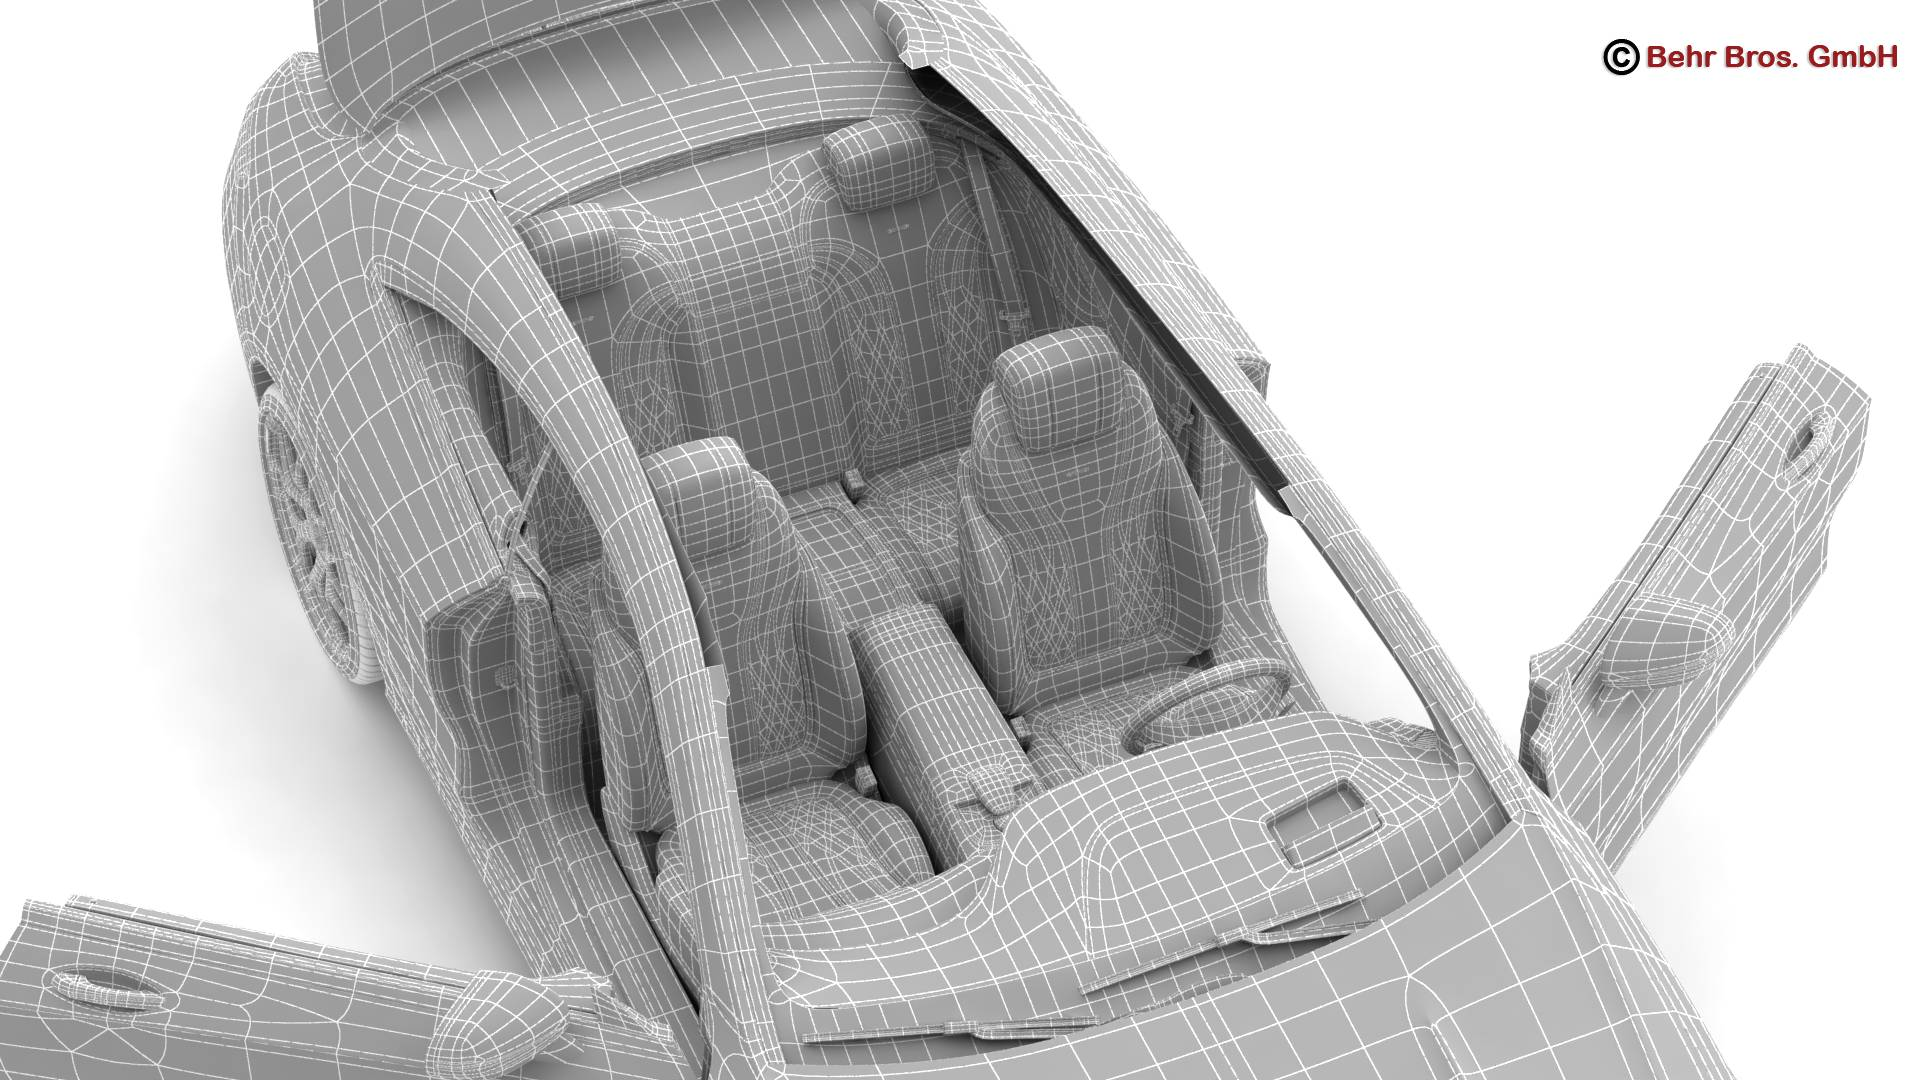 mercedes s class coupe amg s63 2018 3d model 3ds max fbx c4d lwo ma mb obj 274121